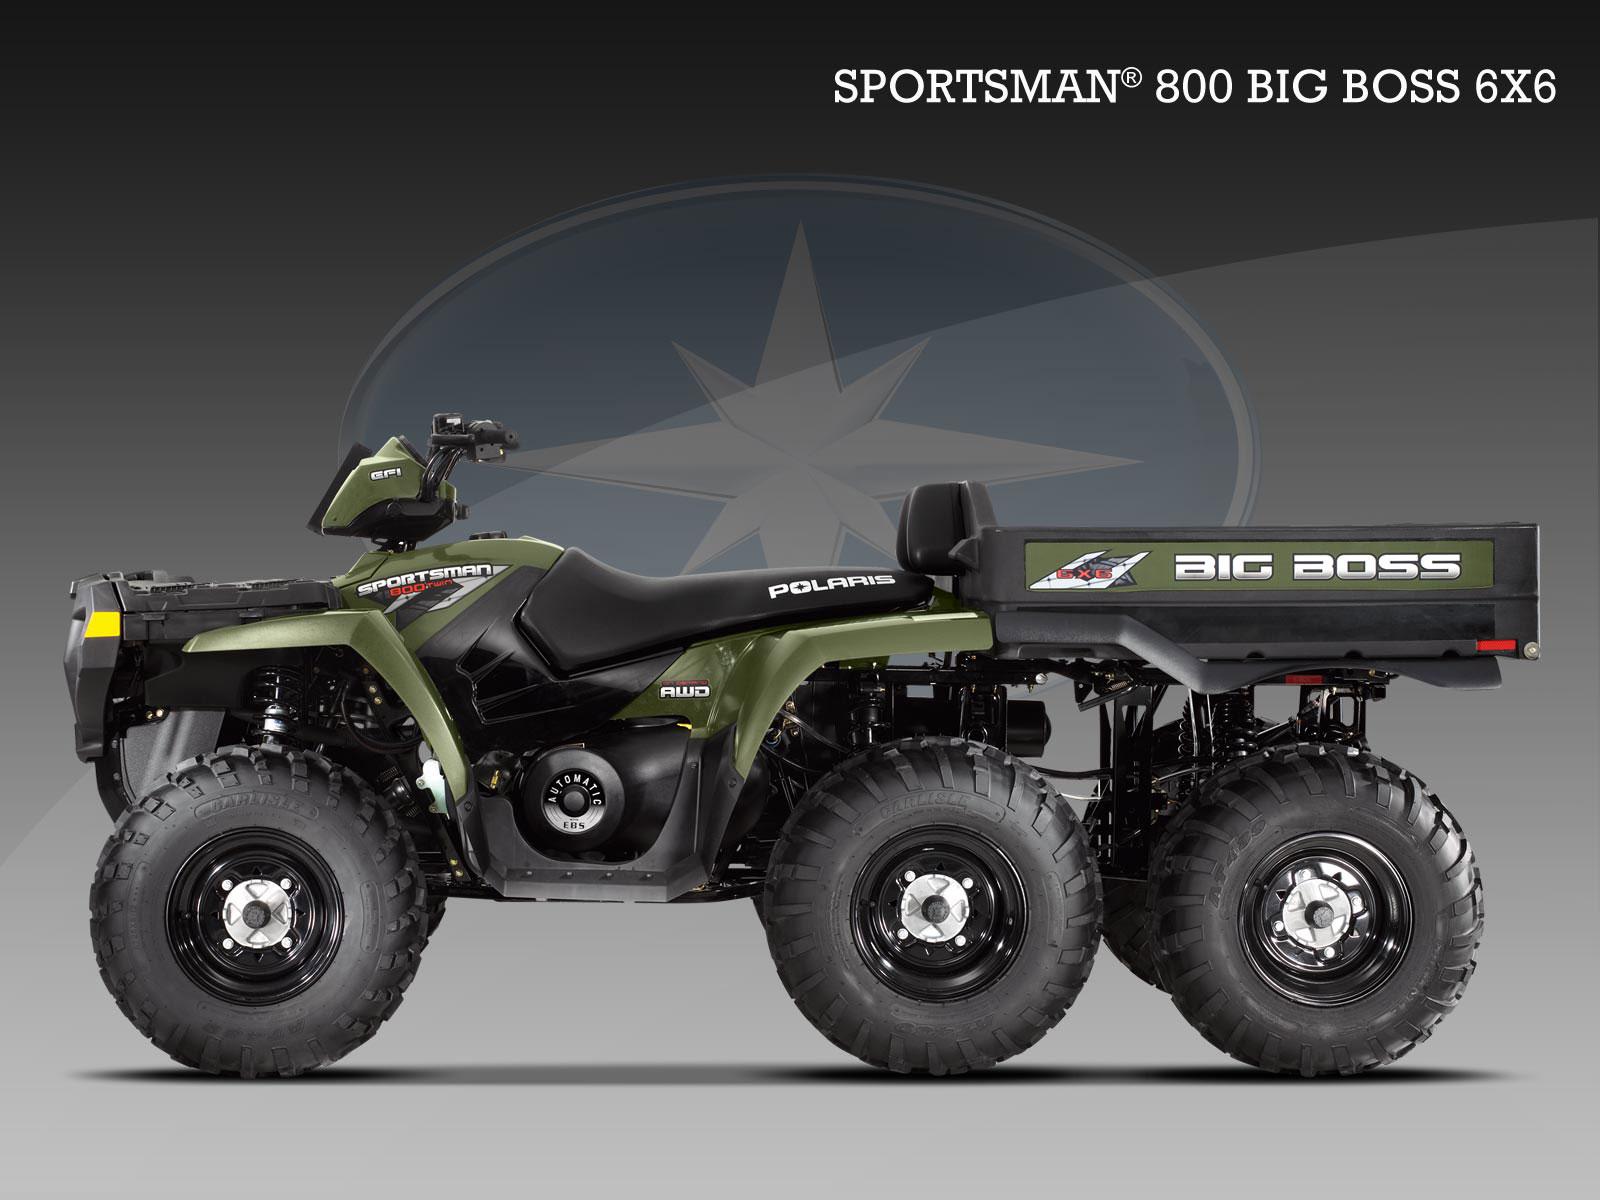 Polaris sportsman big boss 6x6 800 2009 2010